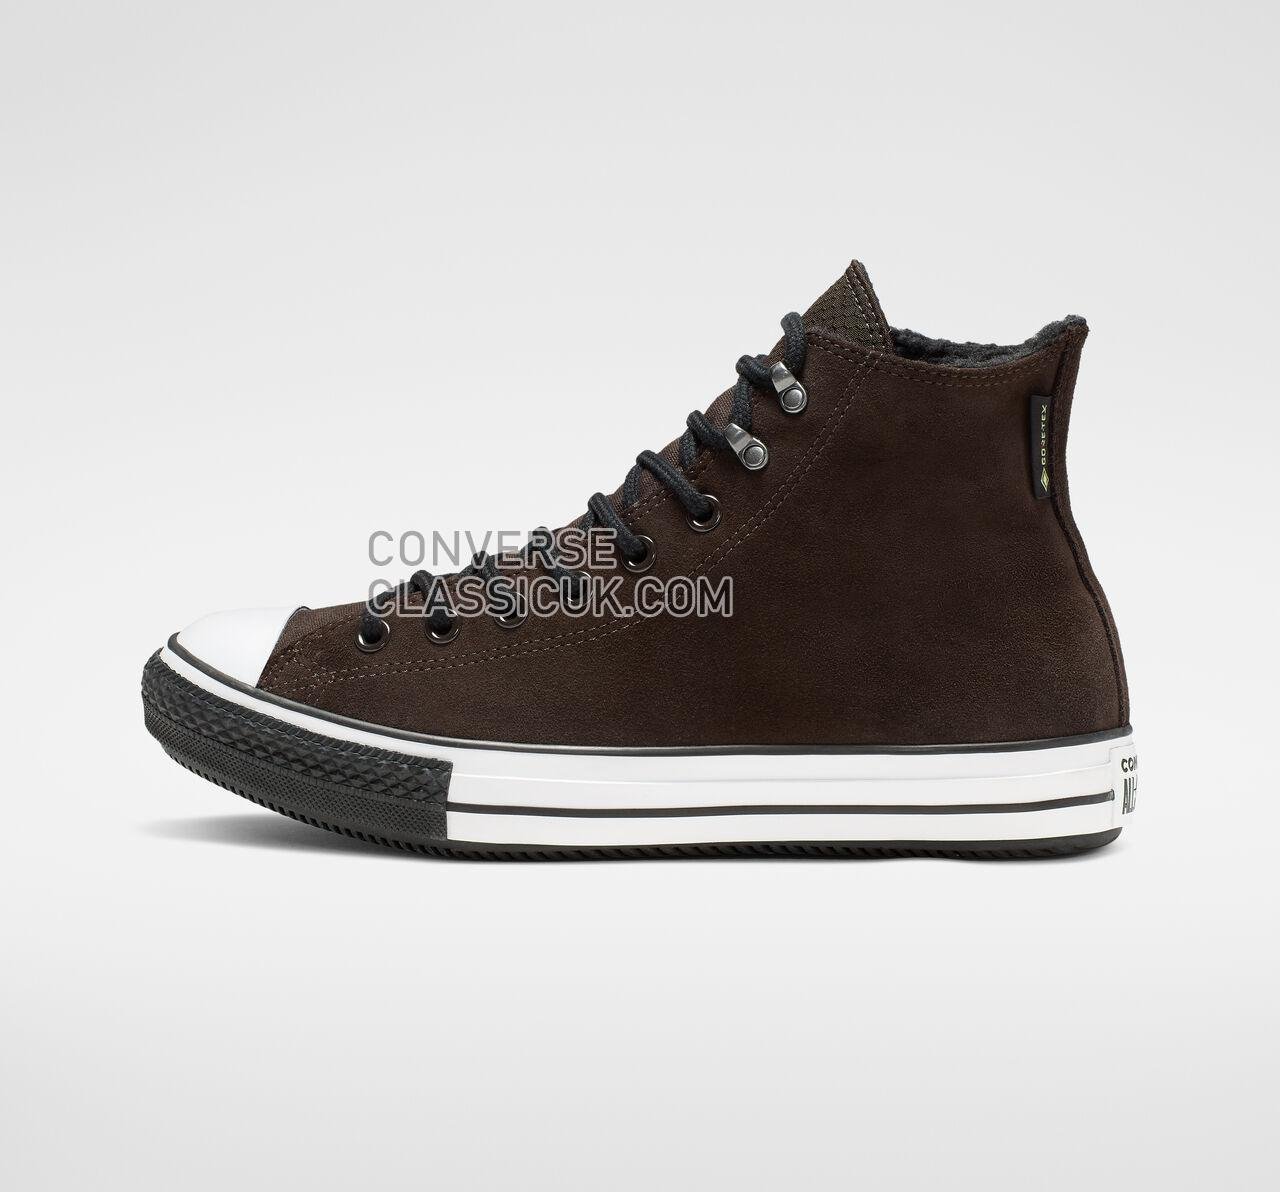 Converse Chuck Taylor All Star Winter Waterproof High Top Mens Womens Unisex 165452C Velvet Brown/White/Black Shoes